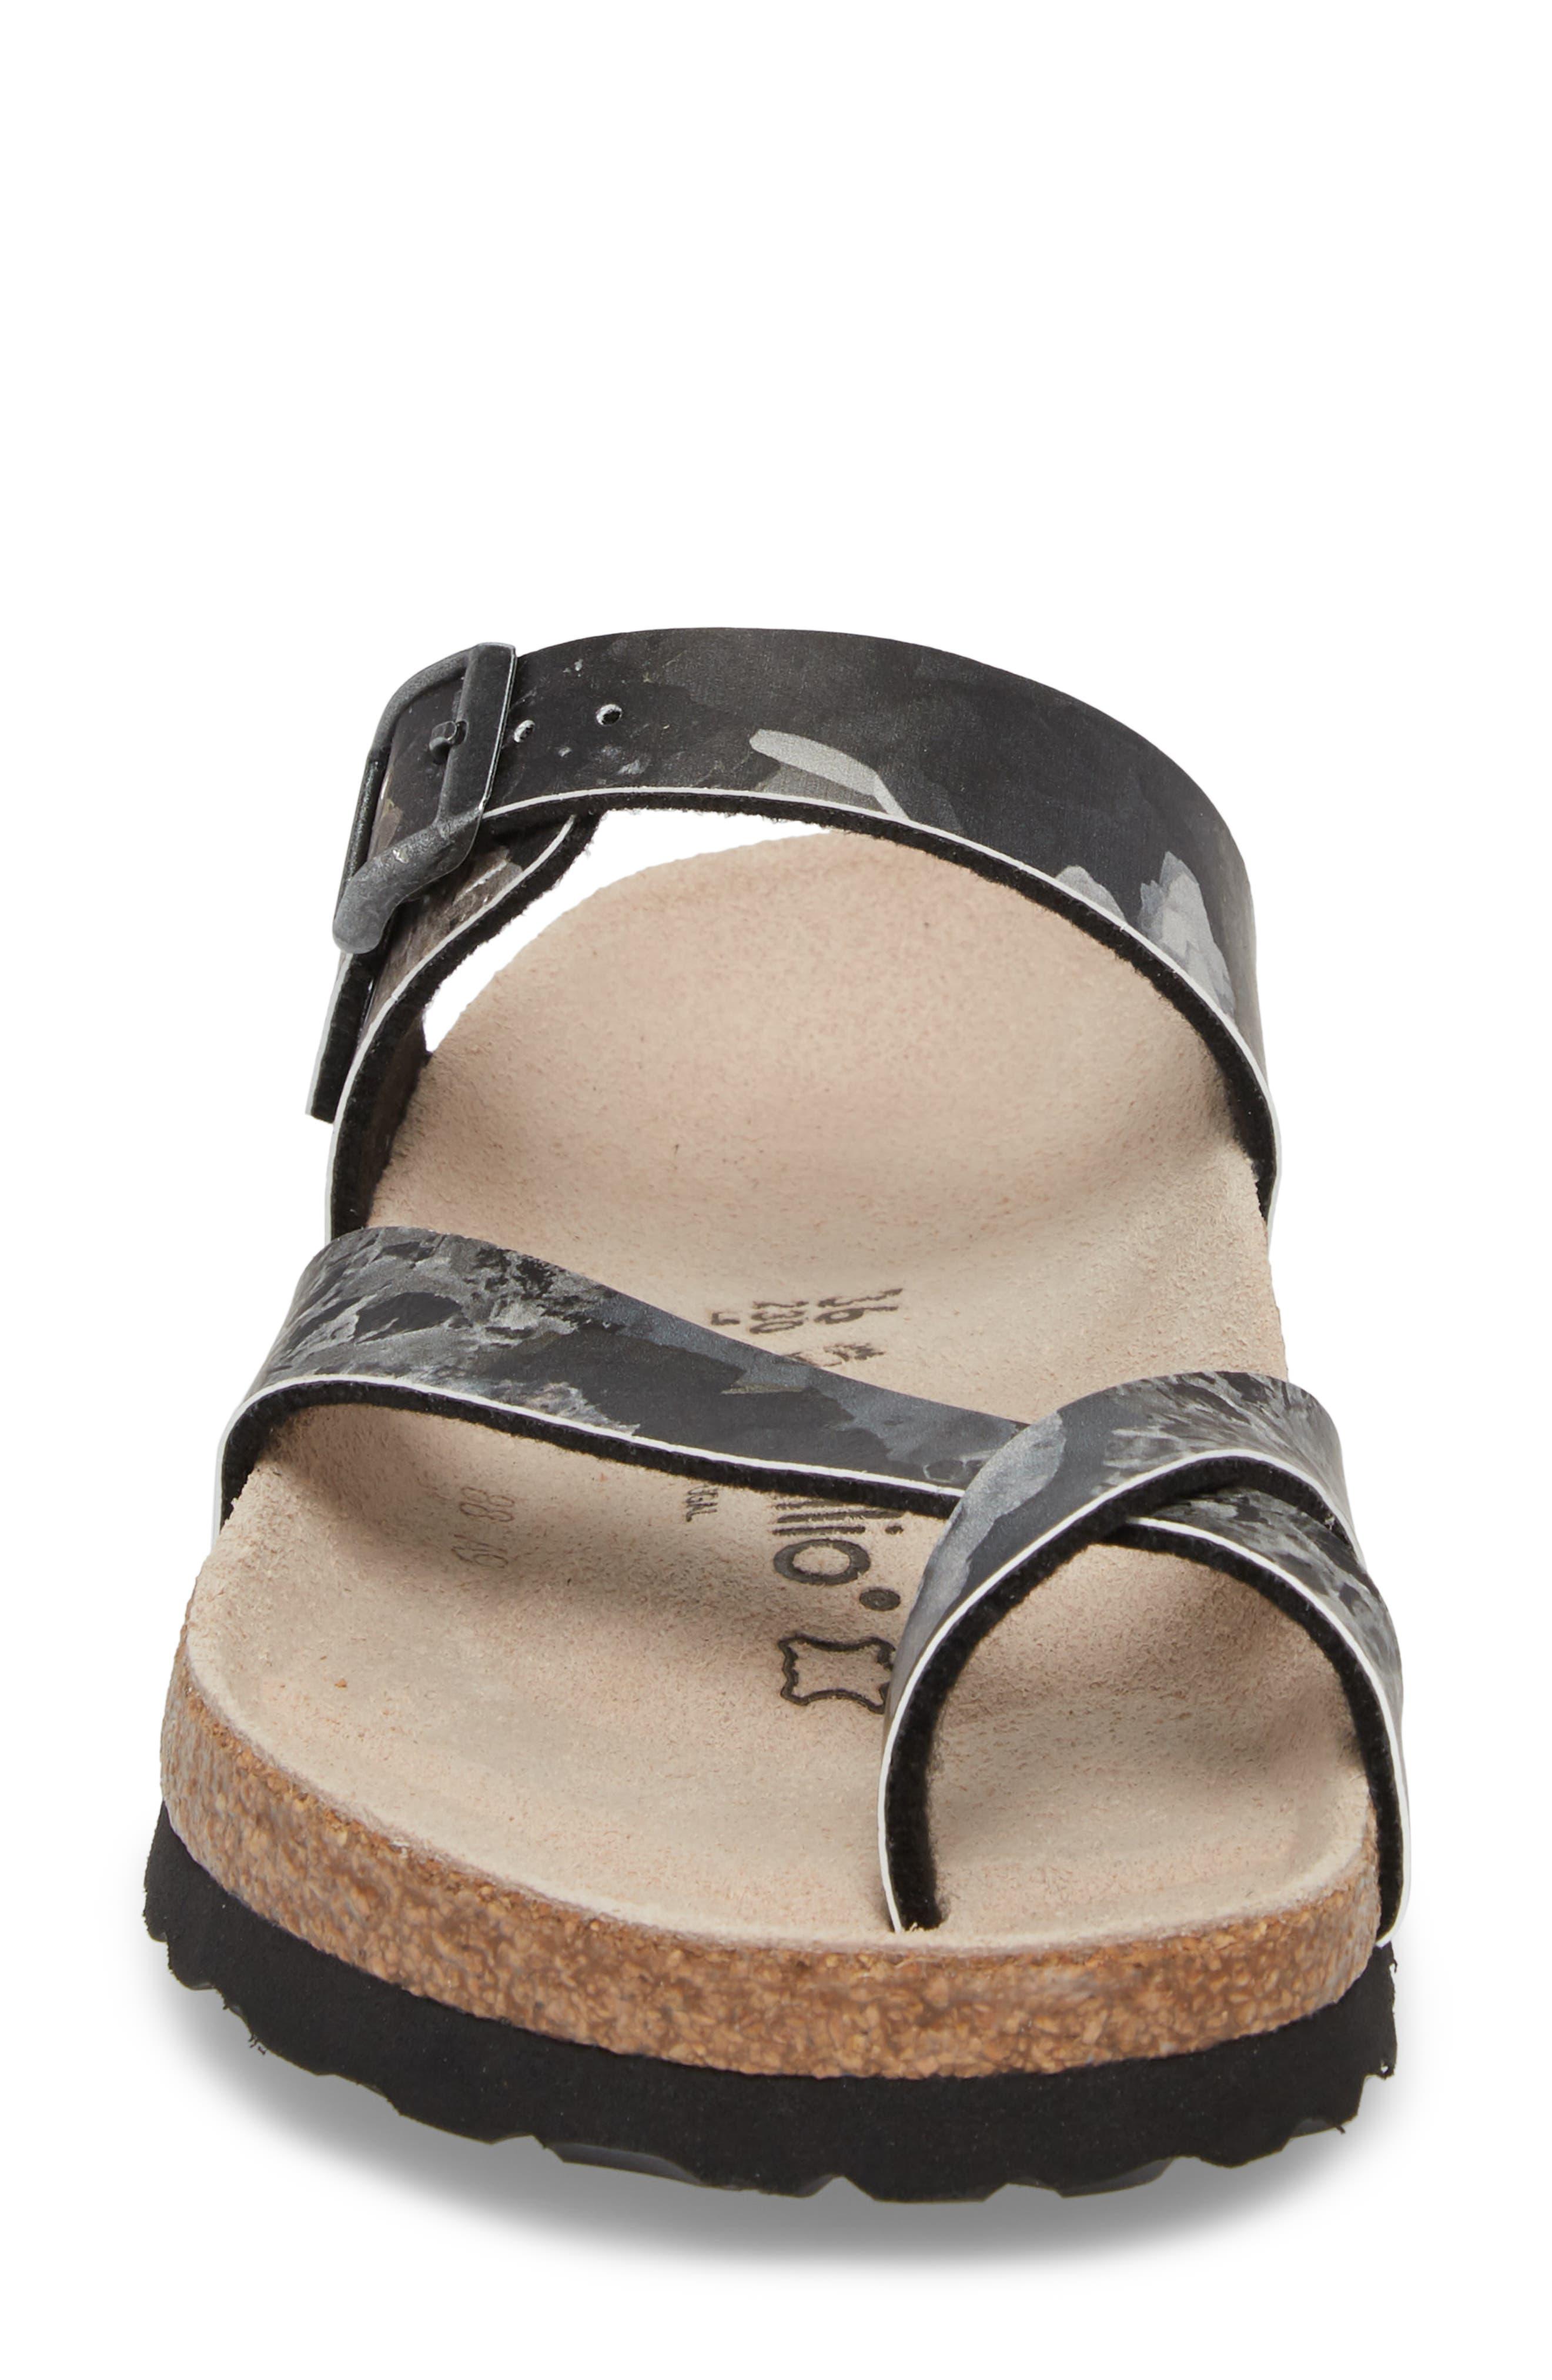 Papillio by Birkenstock Tabora Birko-Flor Slide Sandal,                             Alternate thumbnail 4, color,                             Crystal Black Leather